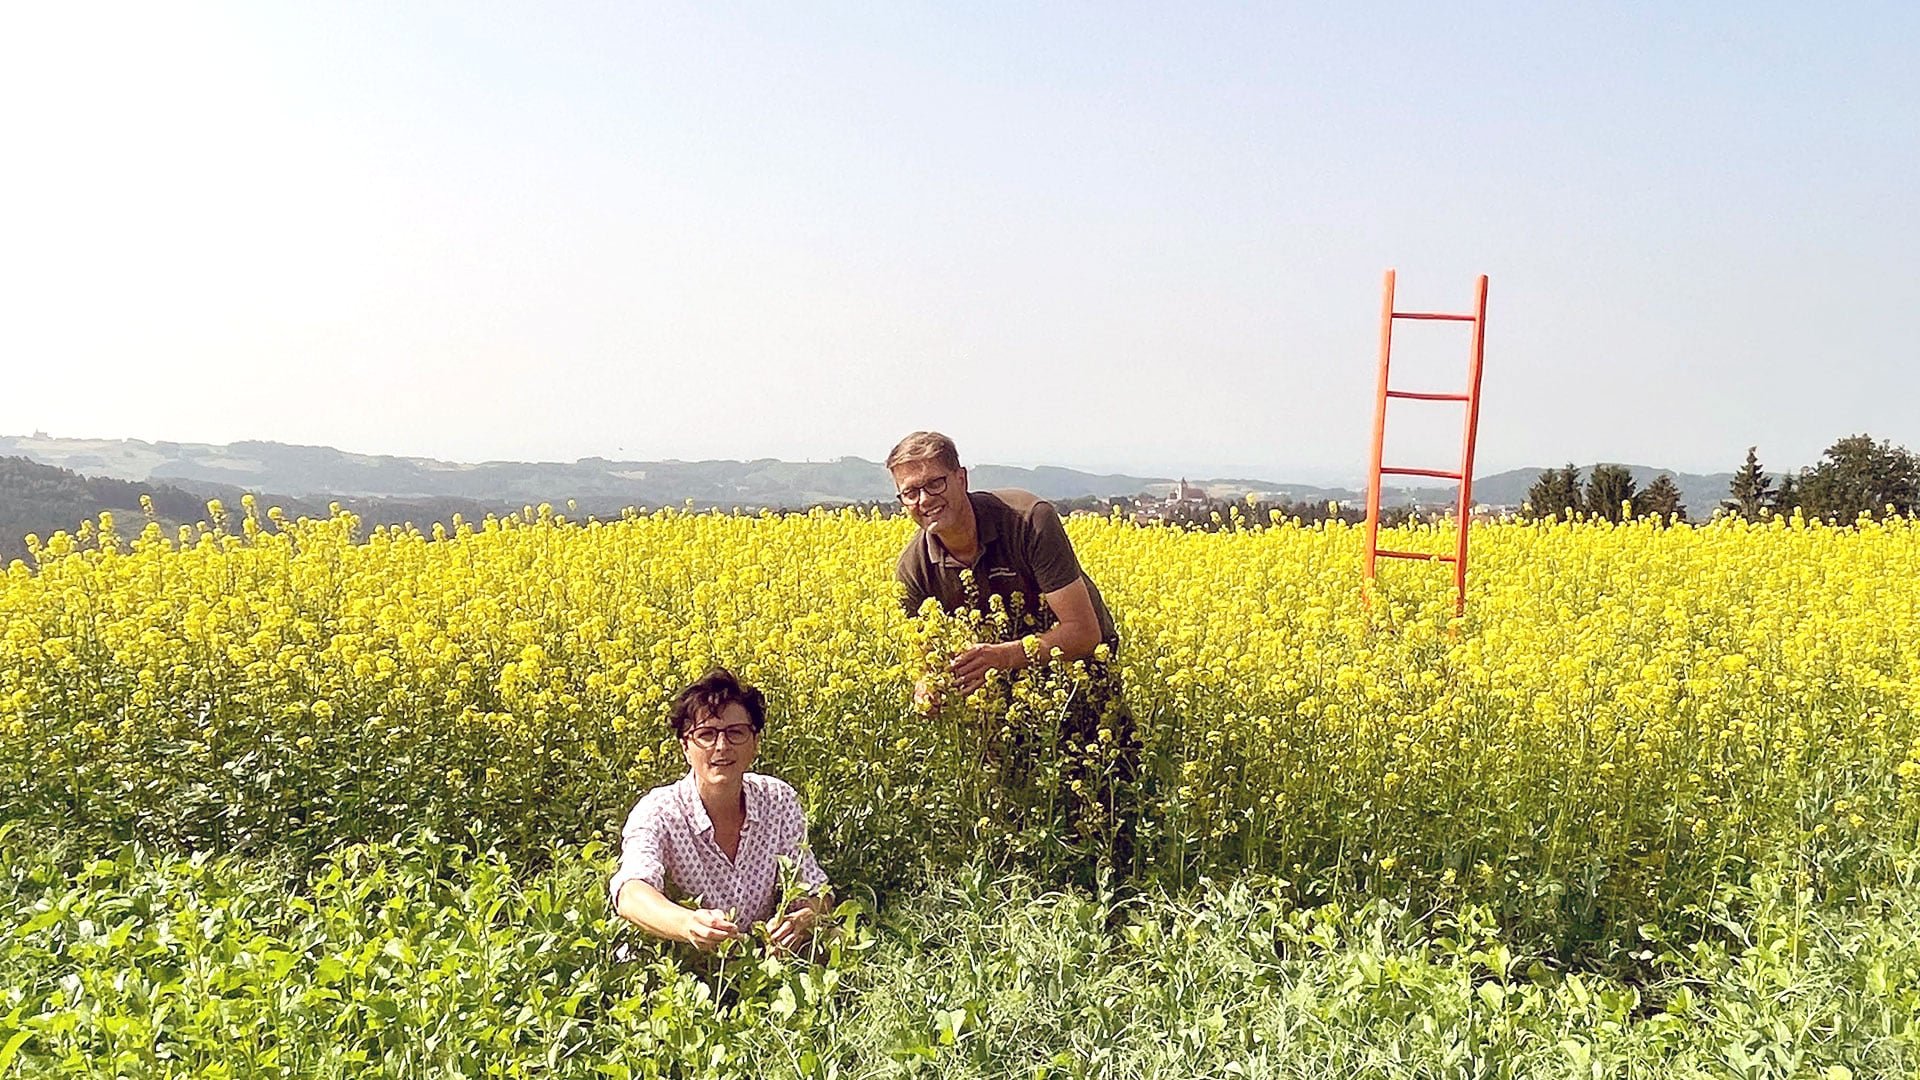 Senfanbau: Feldversuch geglückt